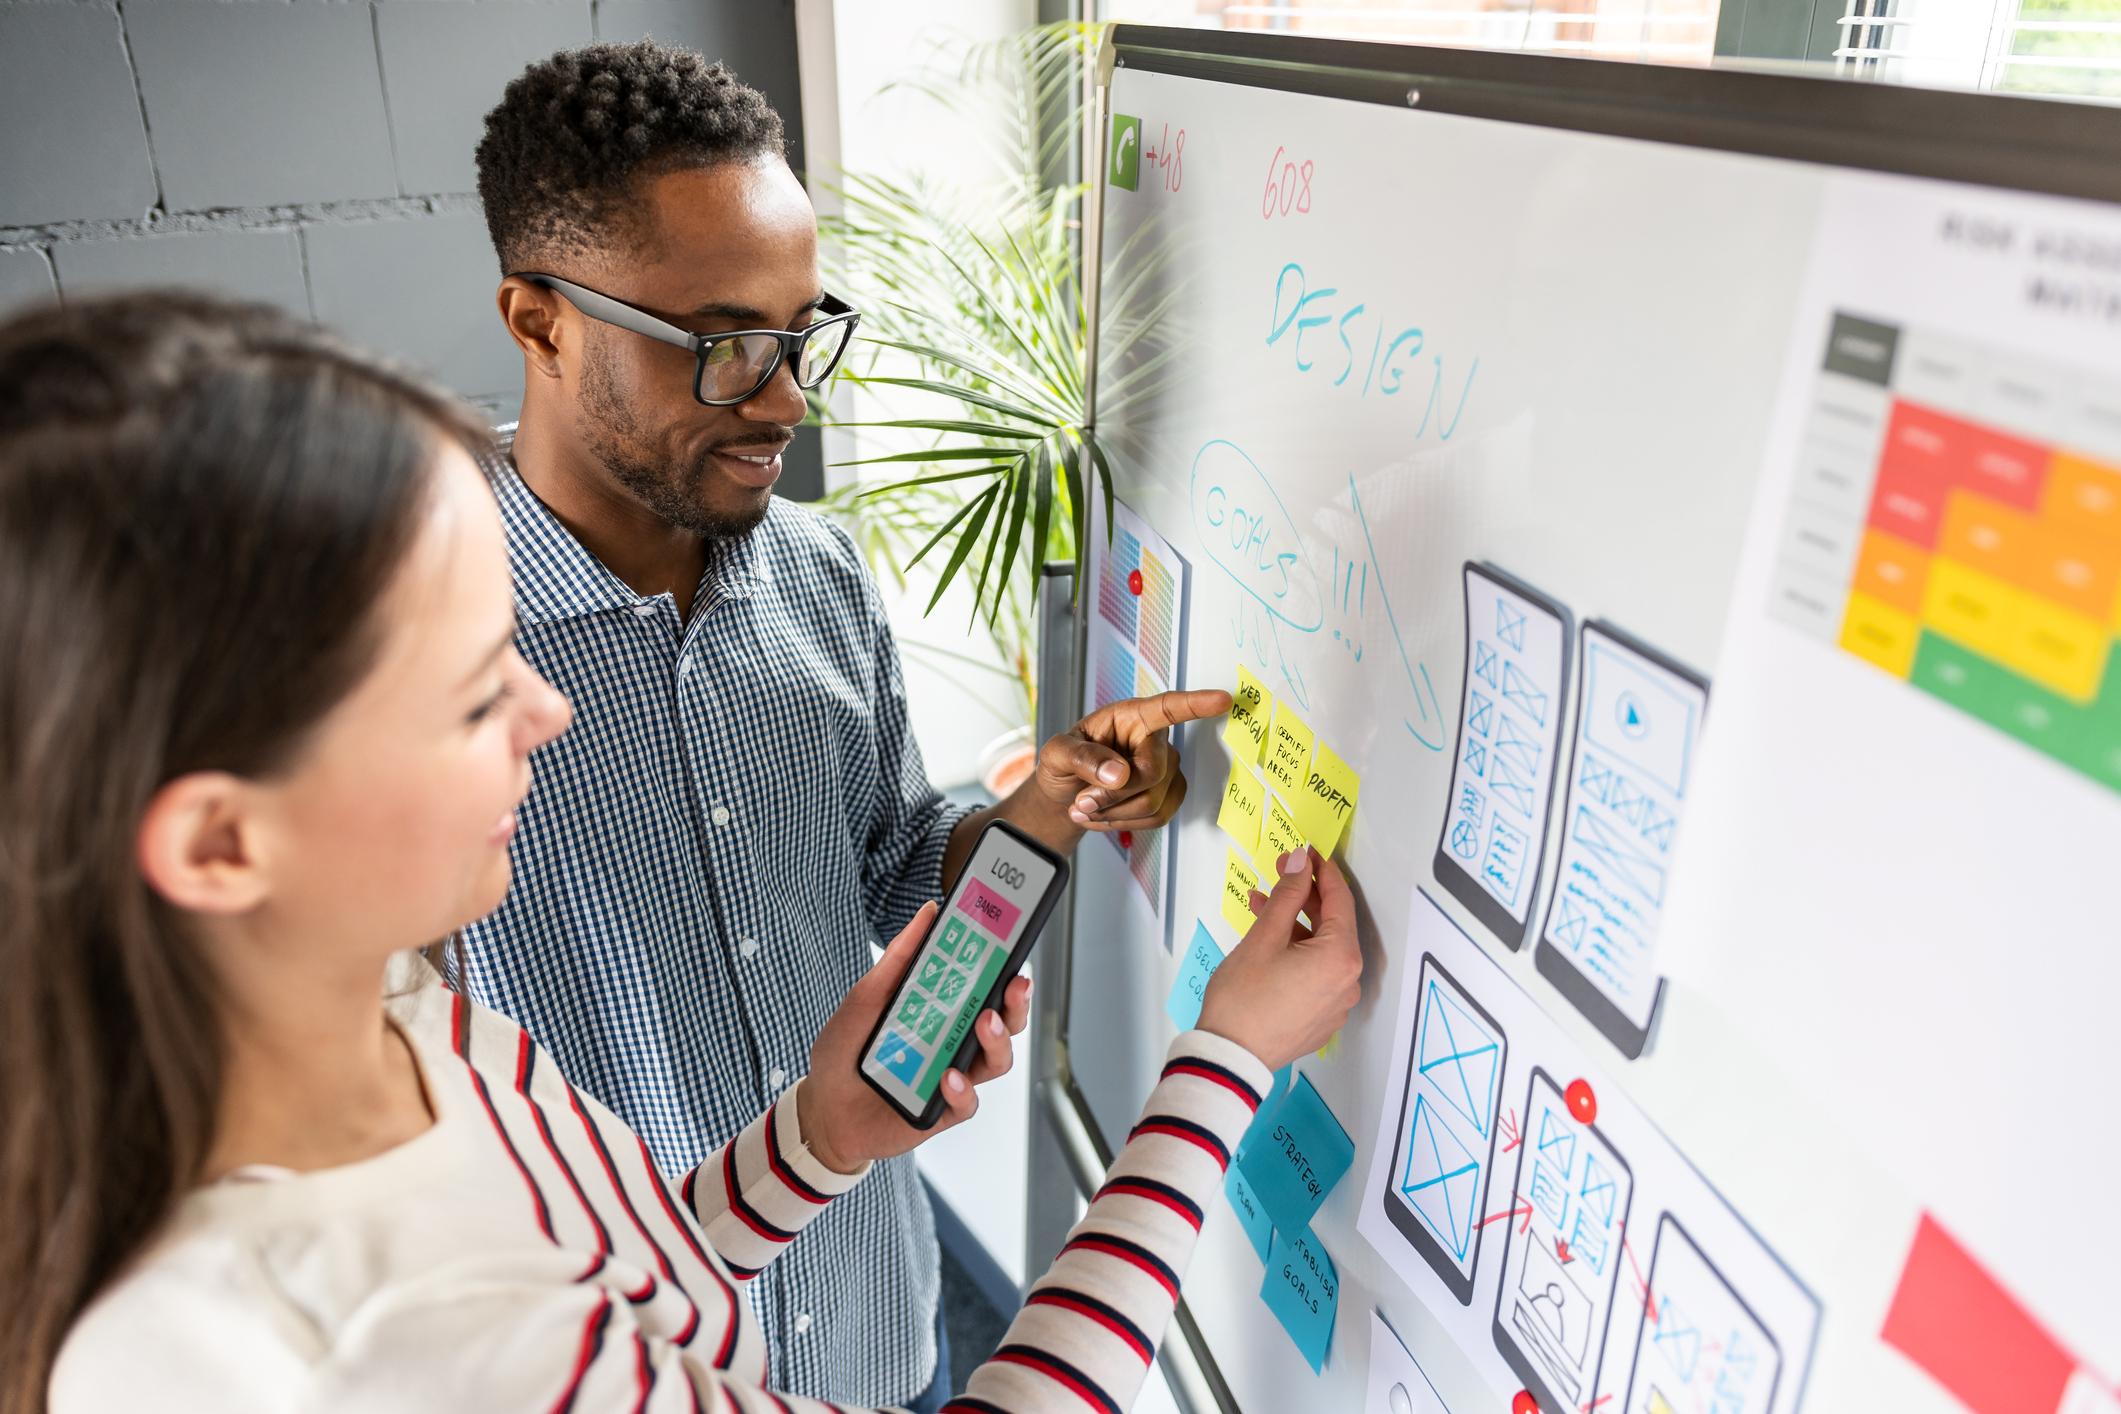 Marketing-team-reviewing-their-company's-brand-evolution-needs